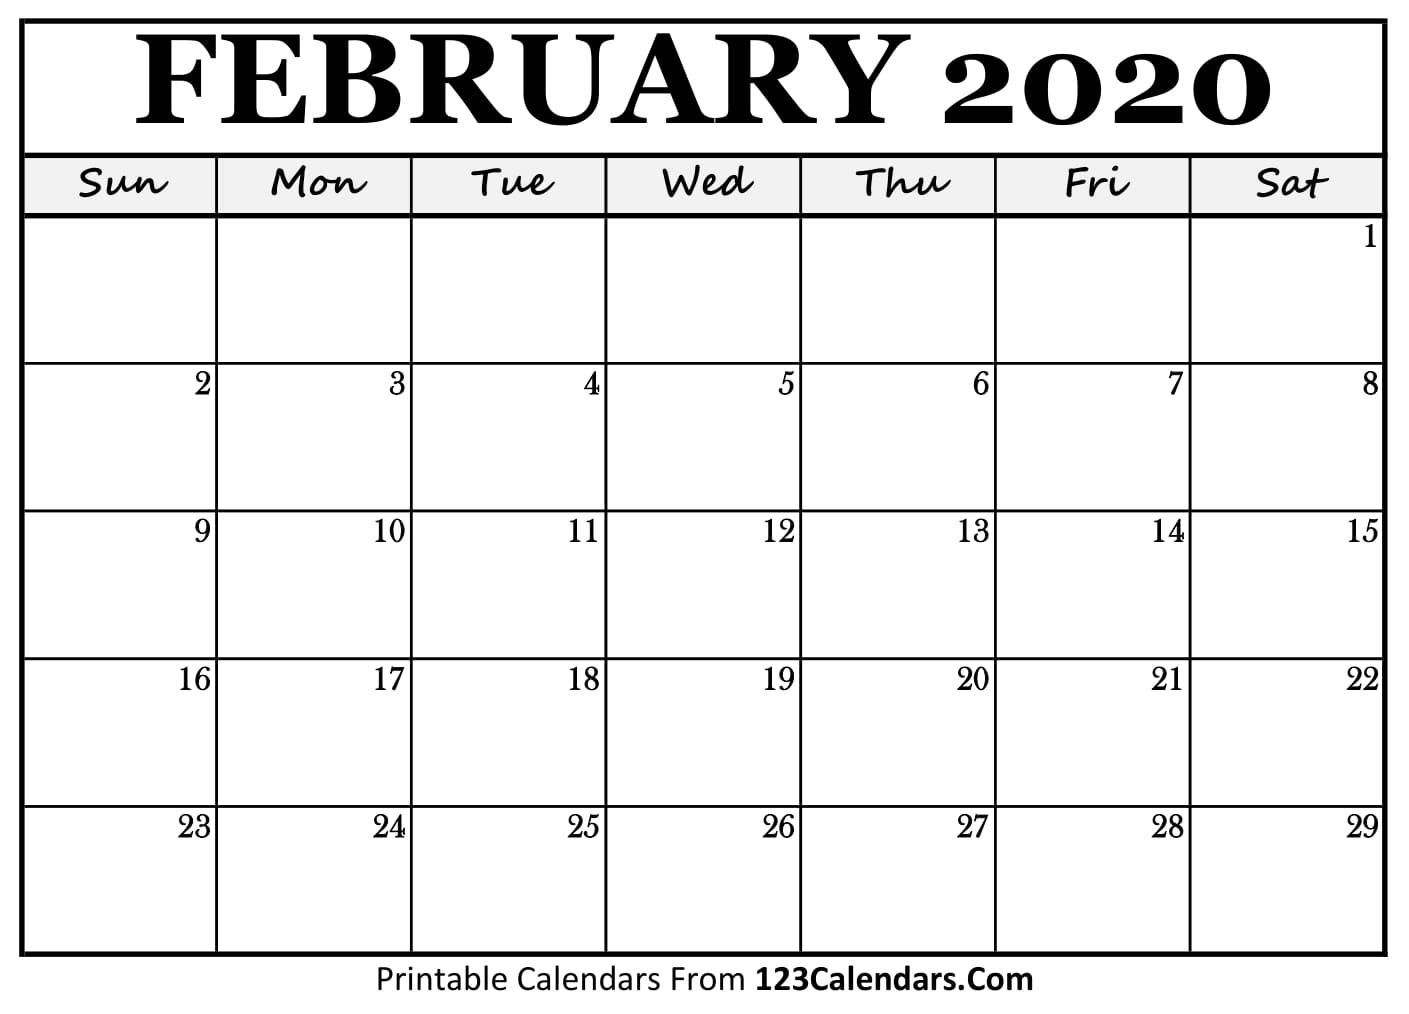 photo relating to Calendar February Printable identified as February 2020 Printable Calendar